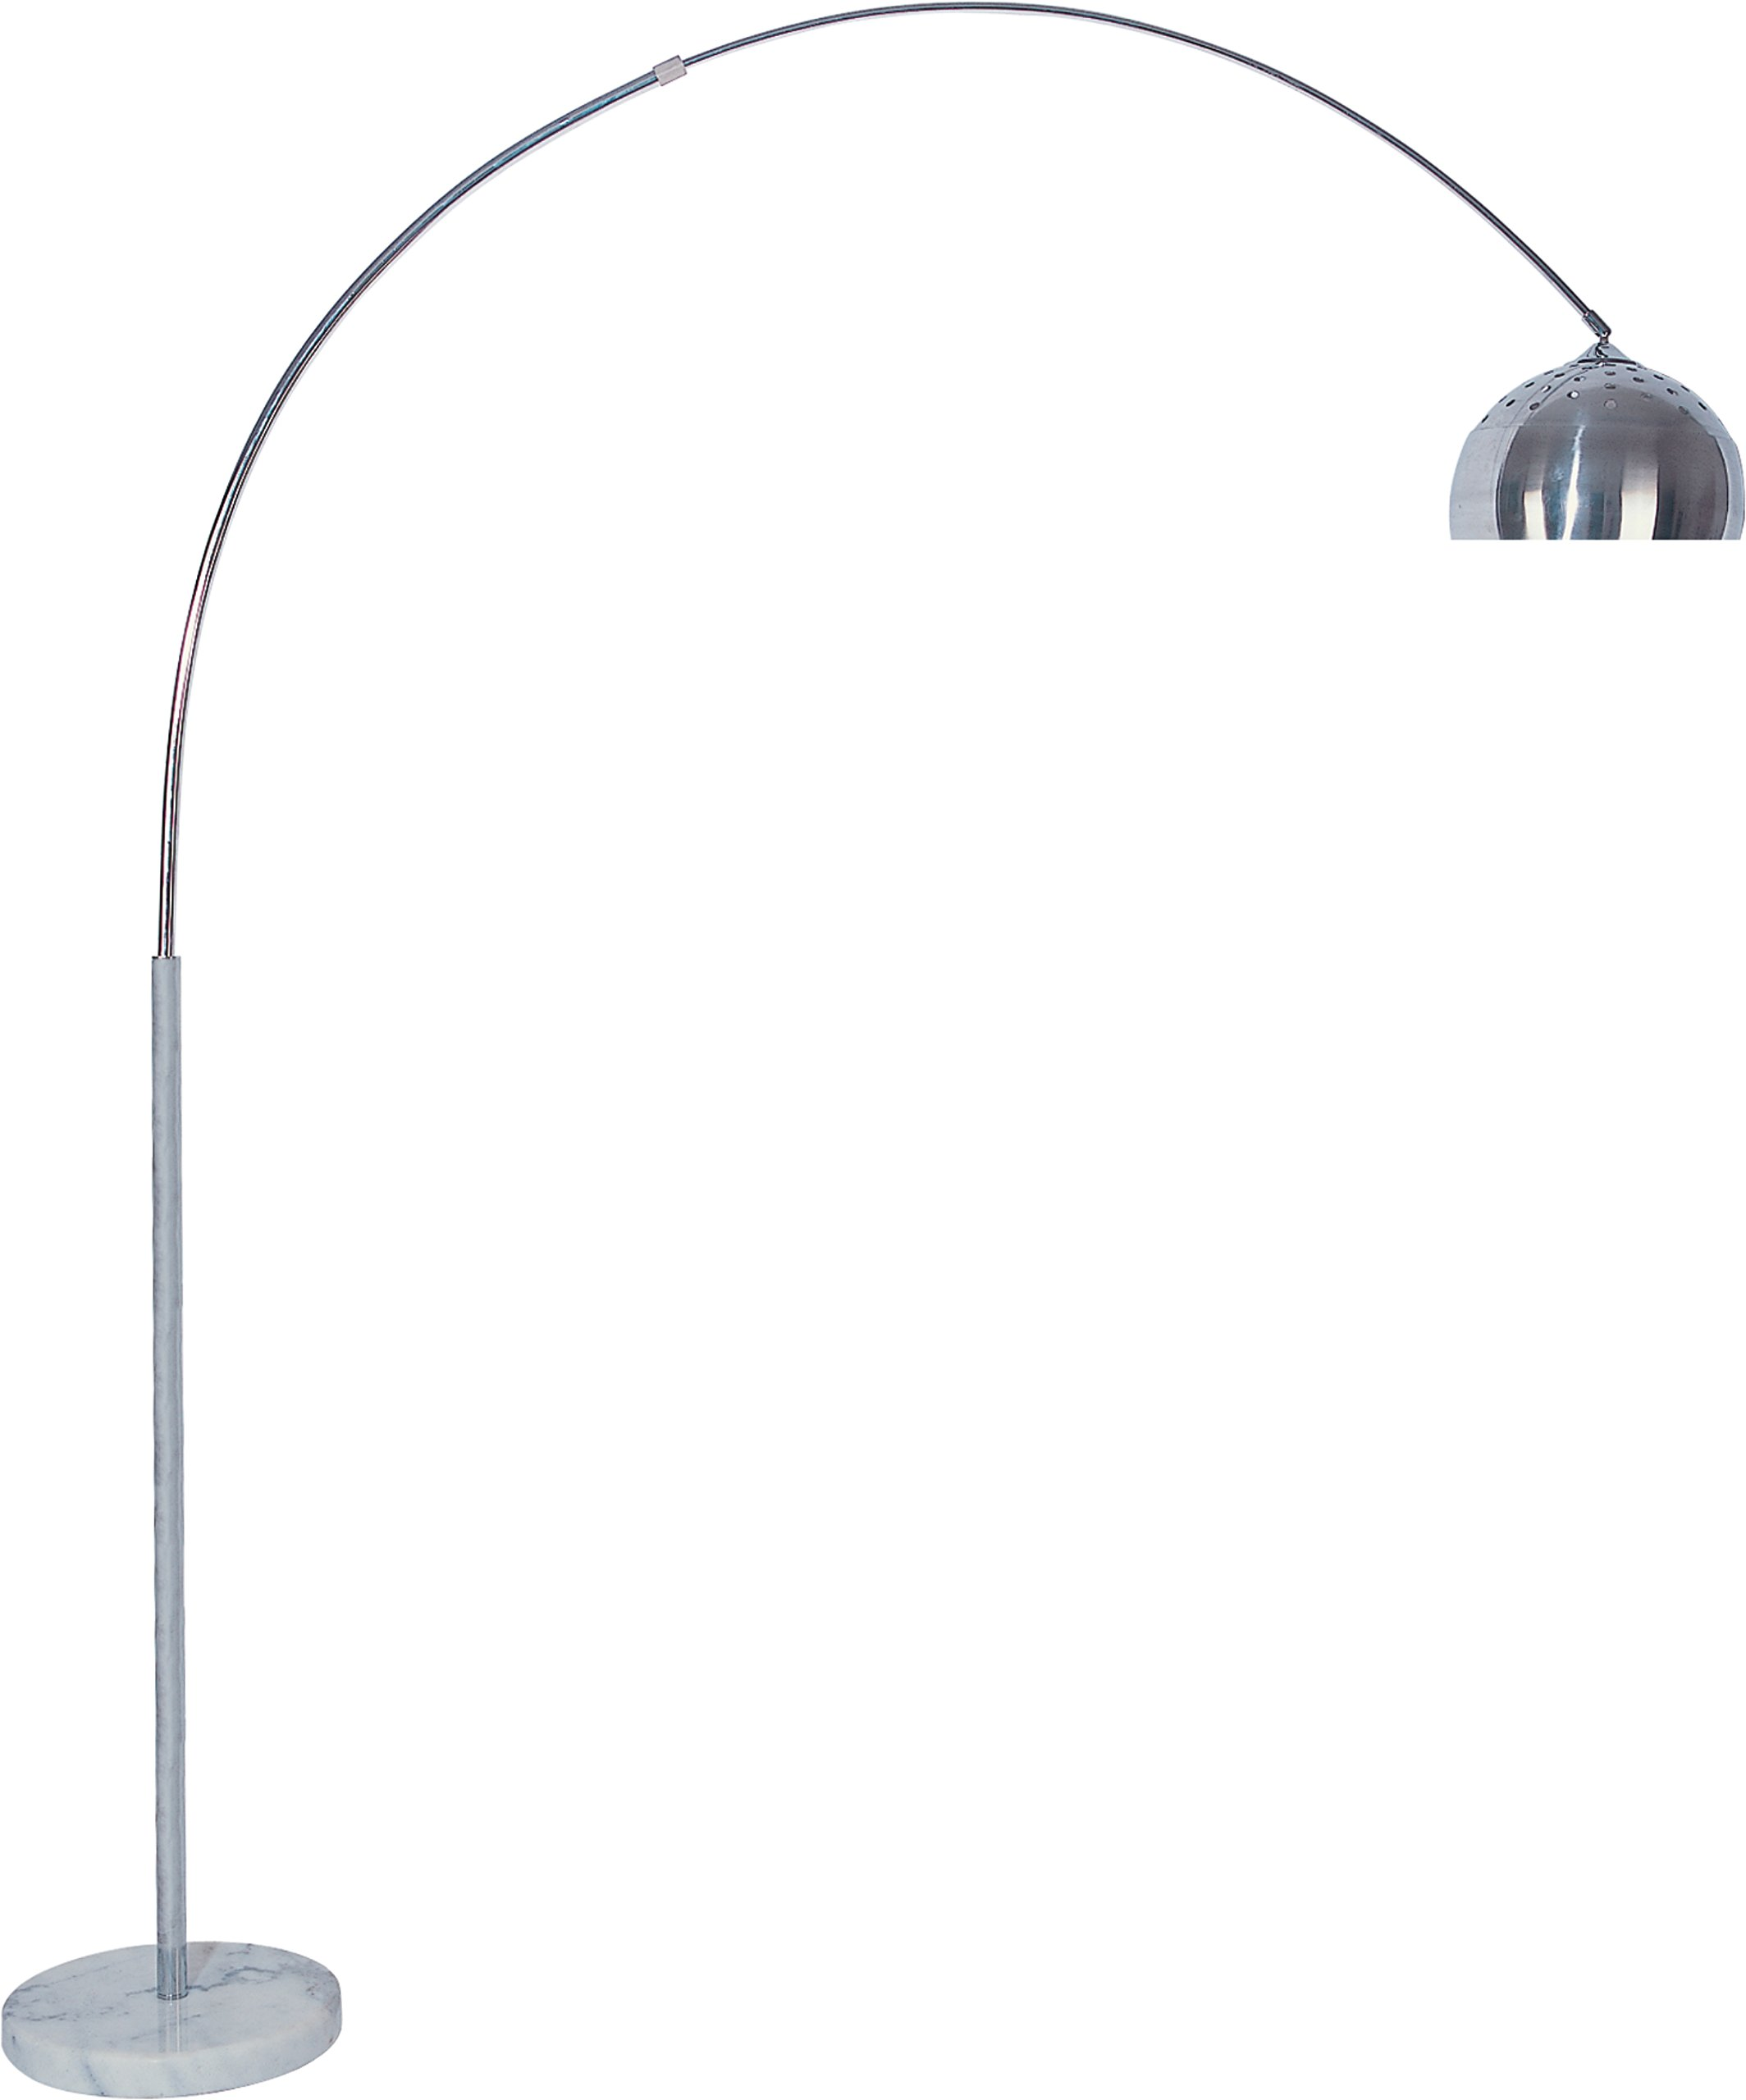 Milton Greens Stars Skyler Adjustable Arc Floor Lamp with Marble Base, 81-Inch